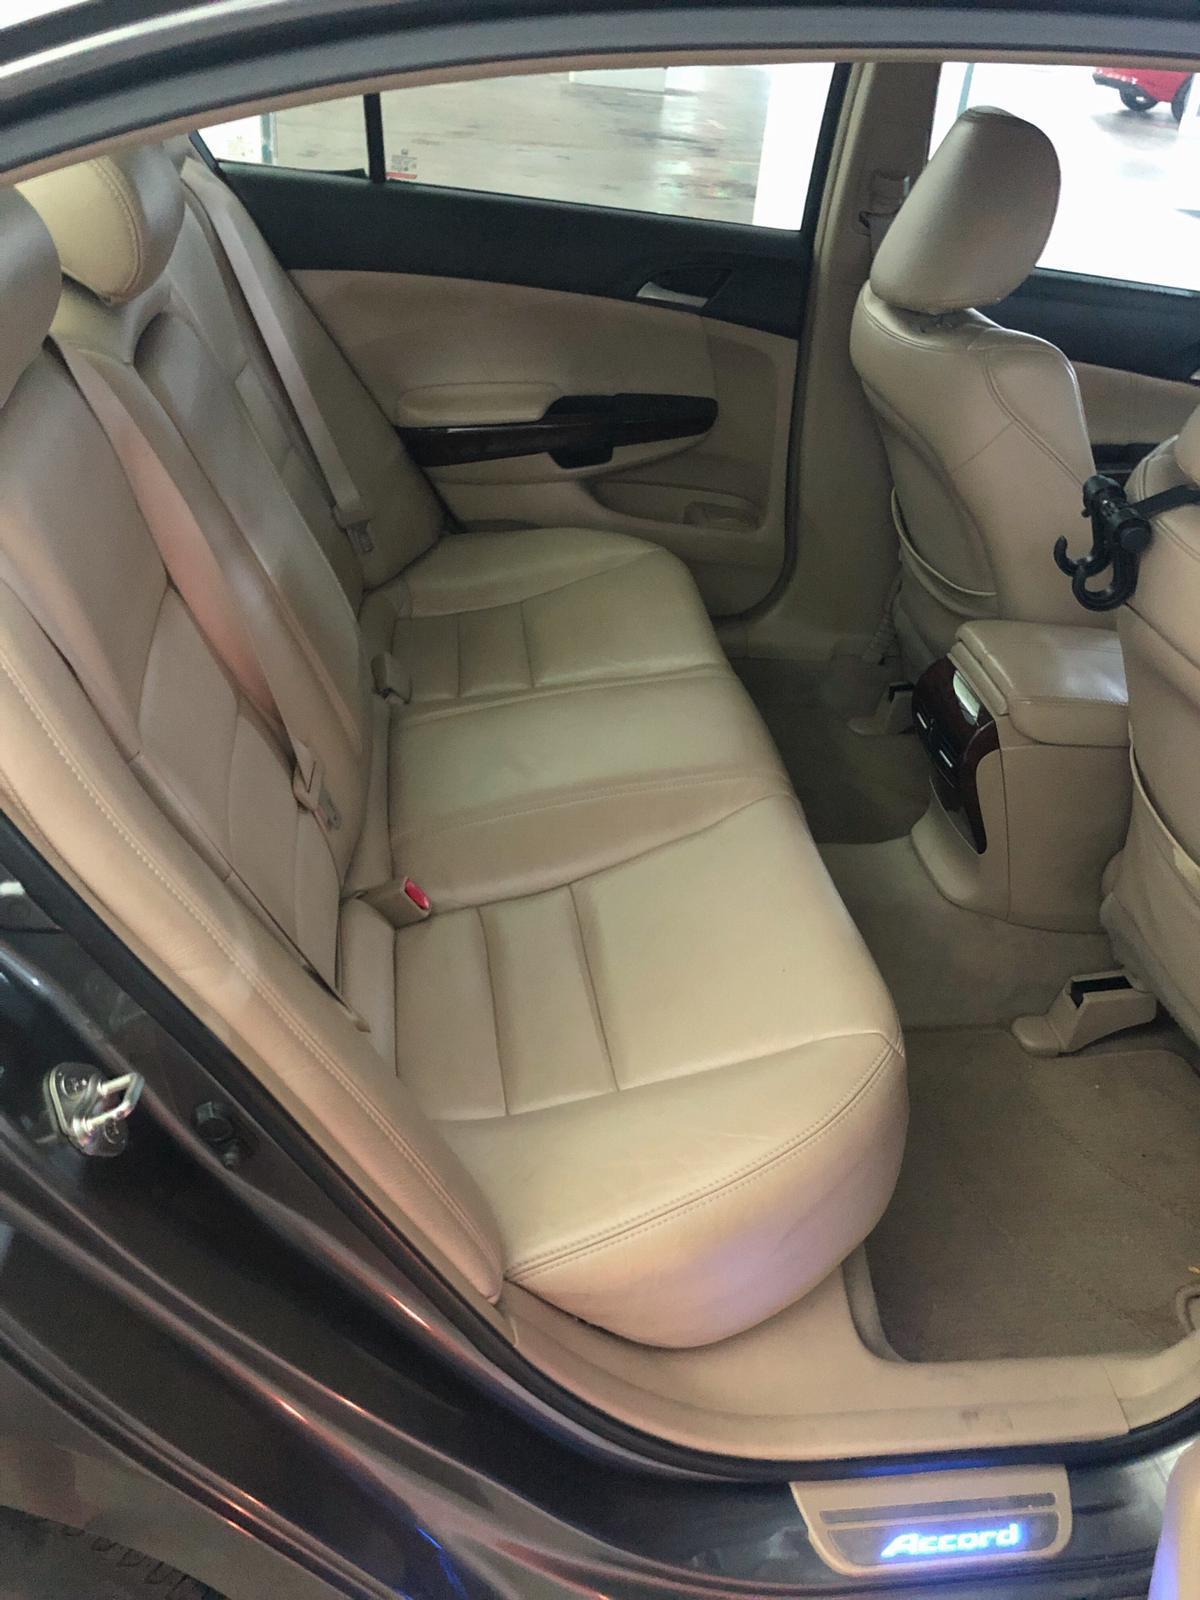 Honda Accord for GoJek Ryde Grab Personal Use Cheapest Car Rentl